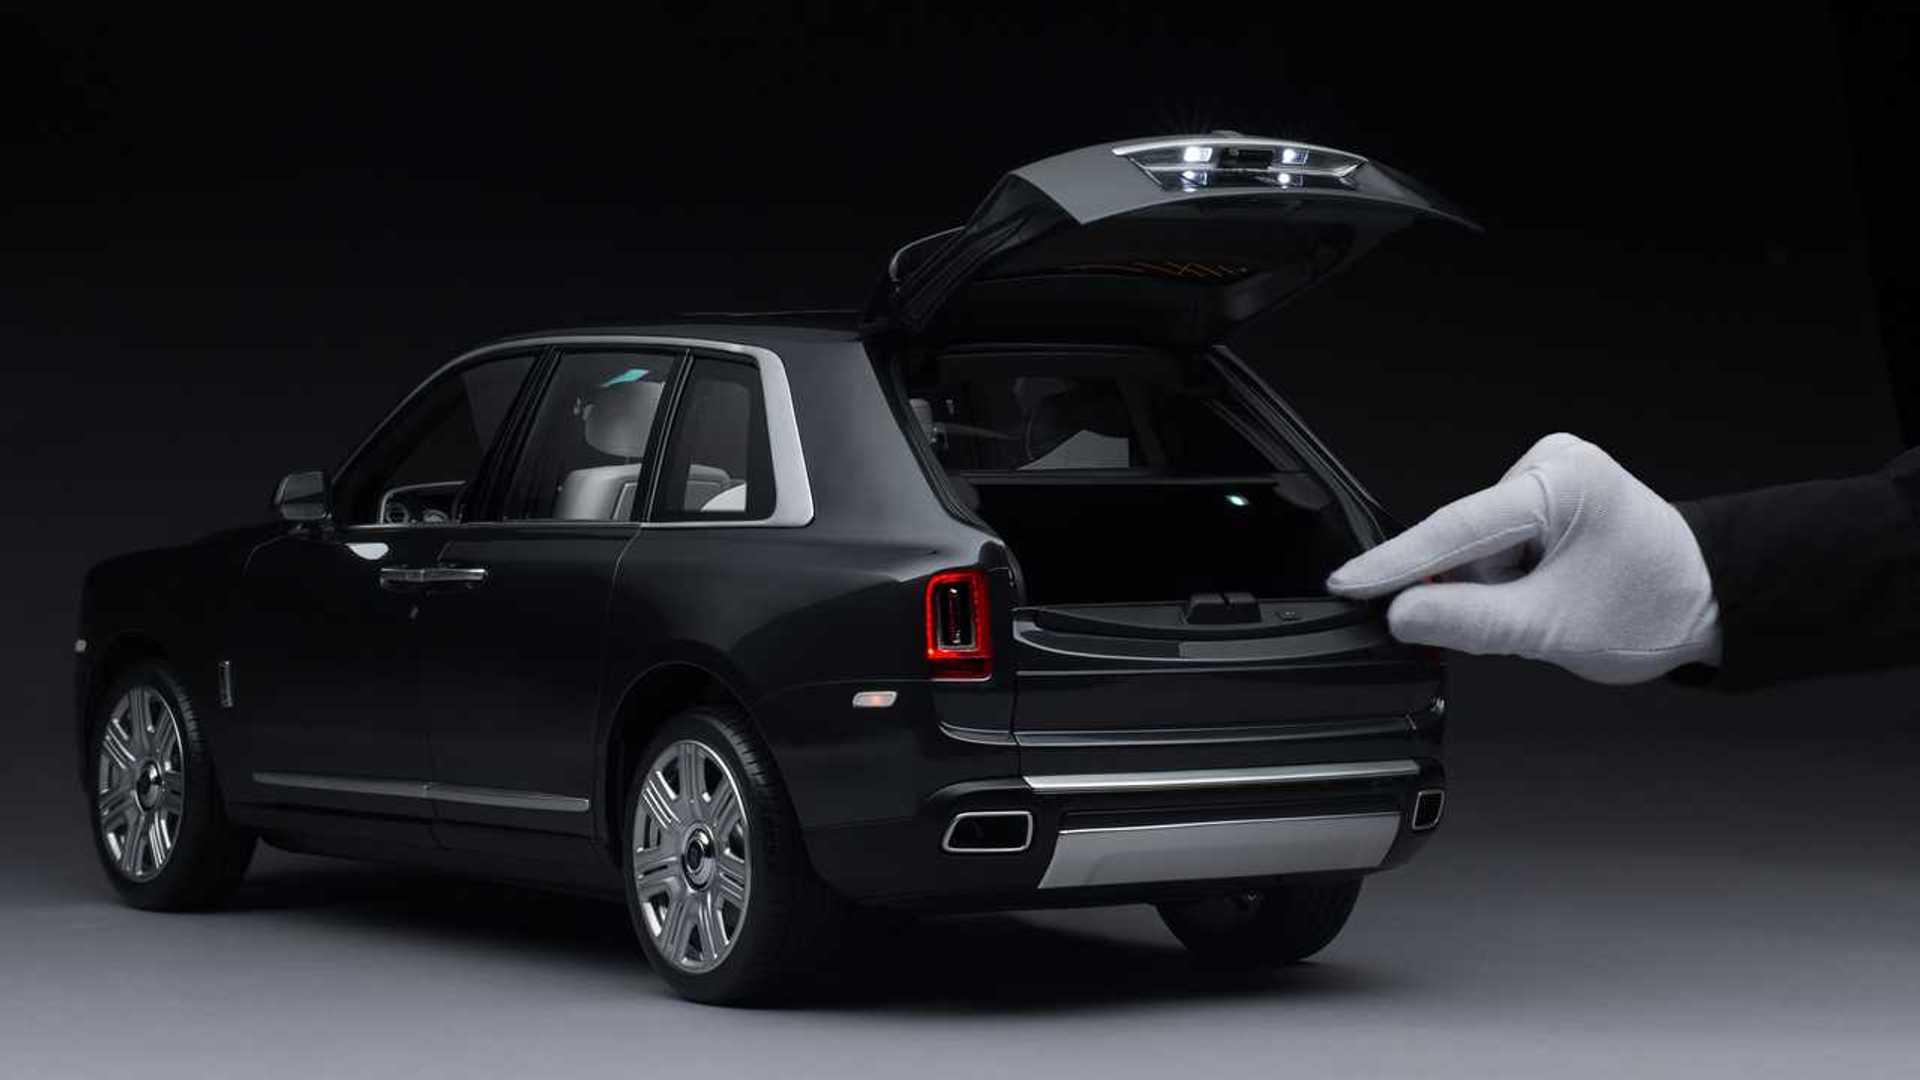 Supercar Blondie Inspects Rolls Royce Cullinan Toy Car That Costs Vw Golf R Money